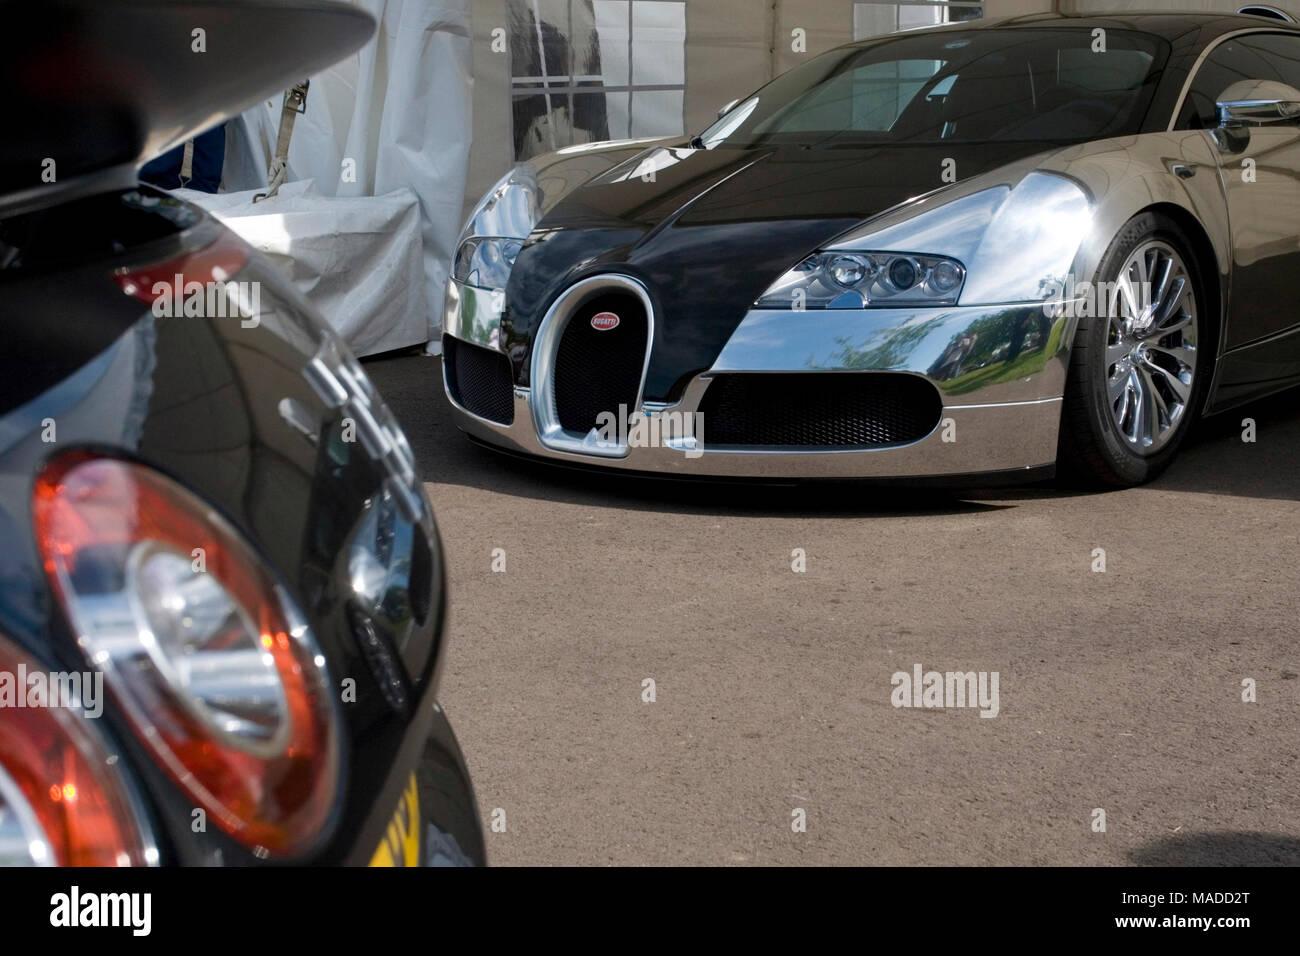 Bugatti Veyron EB 16.4, Prescott speed hill climb, Gloucestershire 2009 - Stock Image